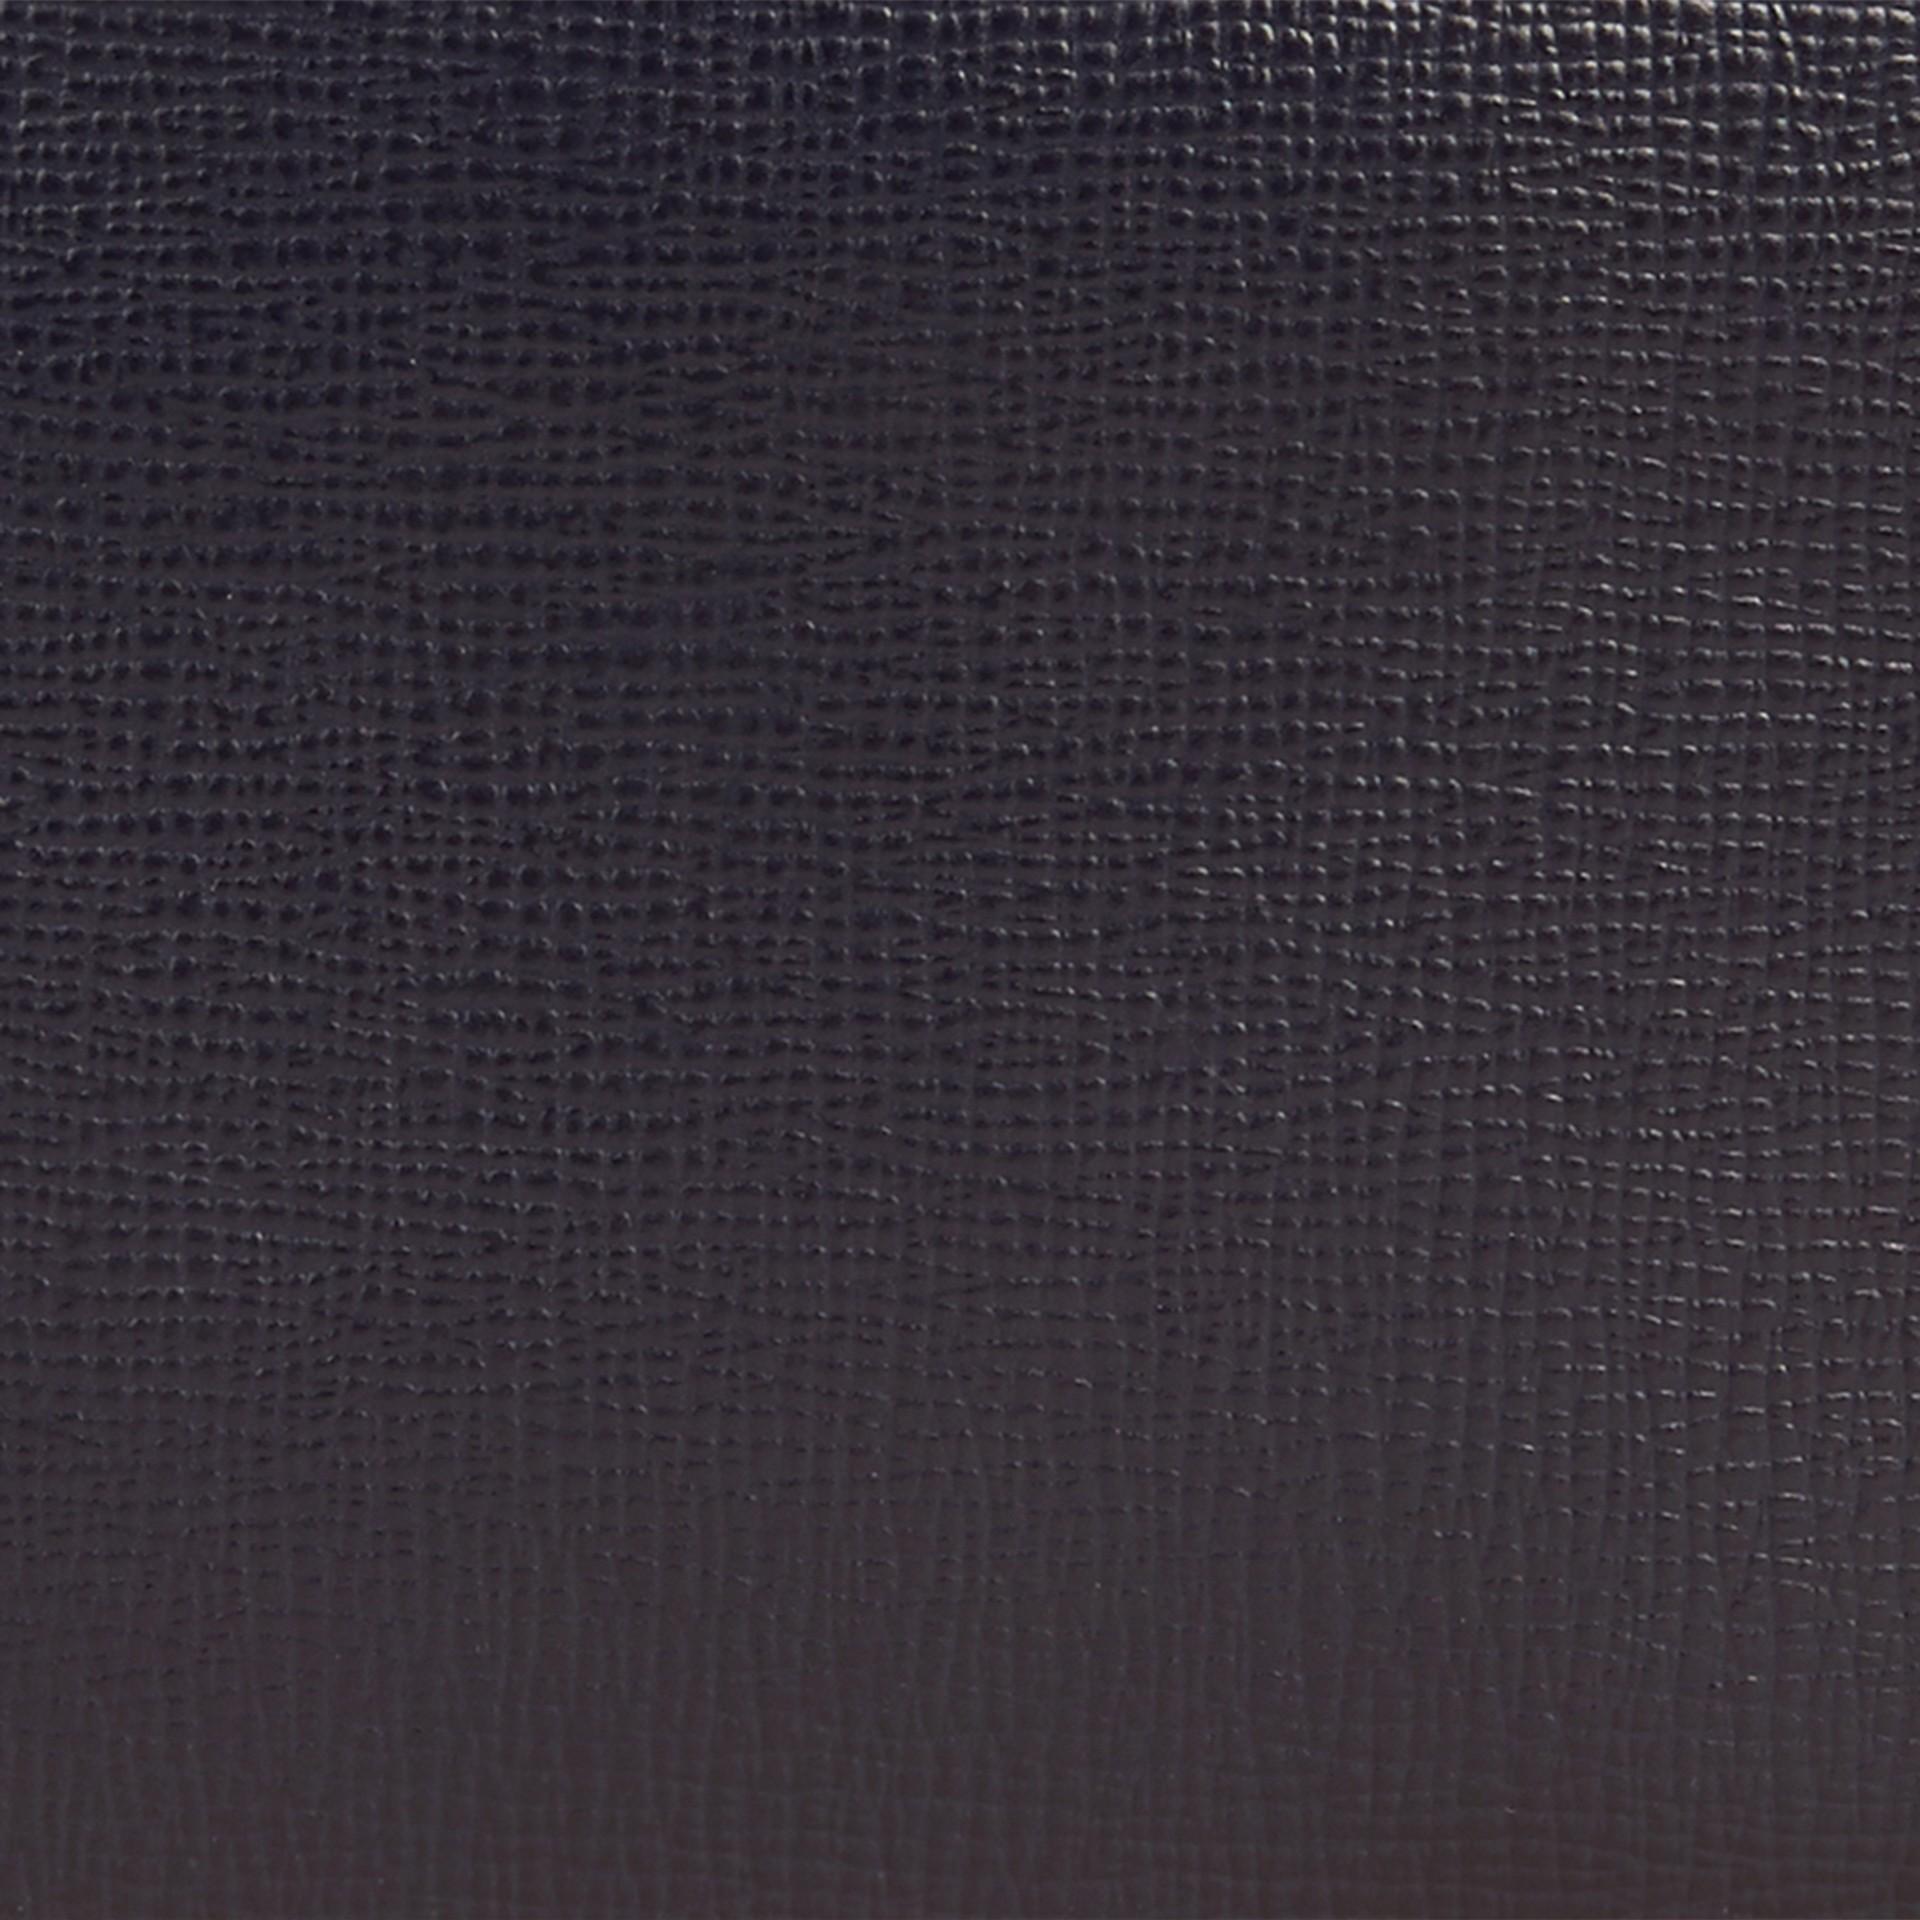 Dark navy London Leather Folding Wallet Dark Navy - gallery image 2